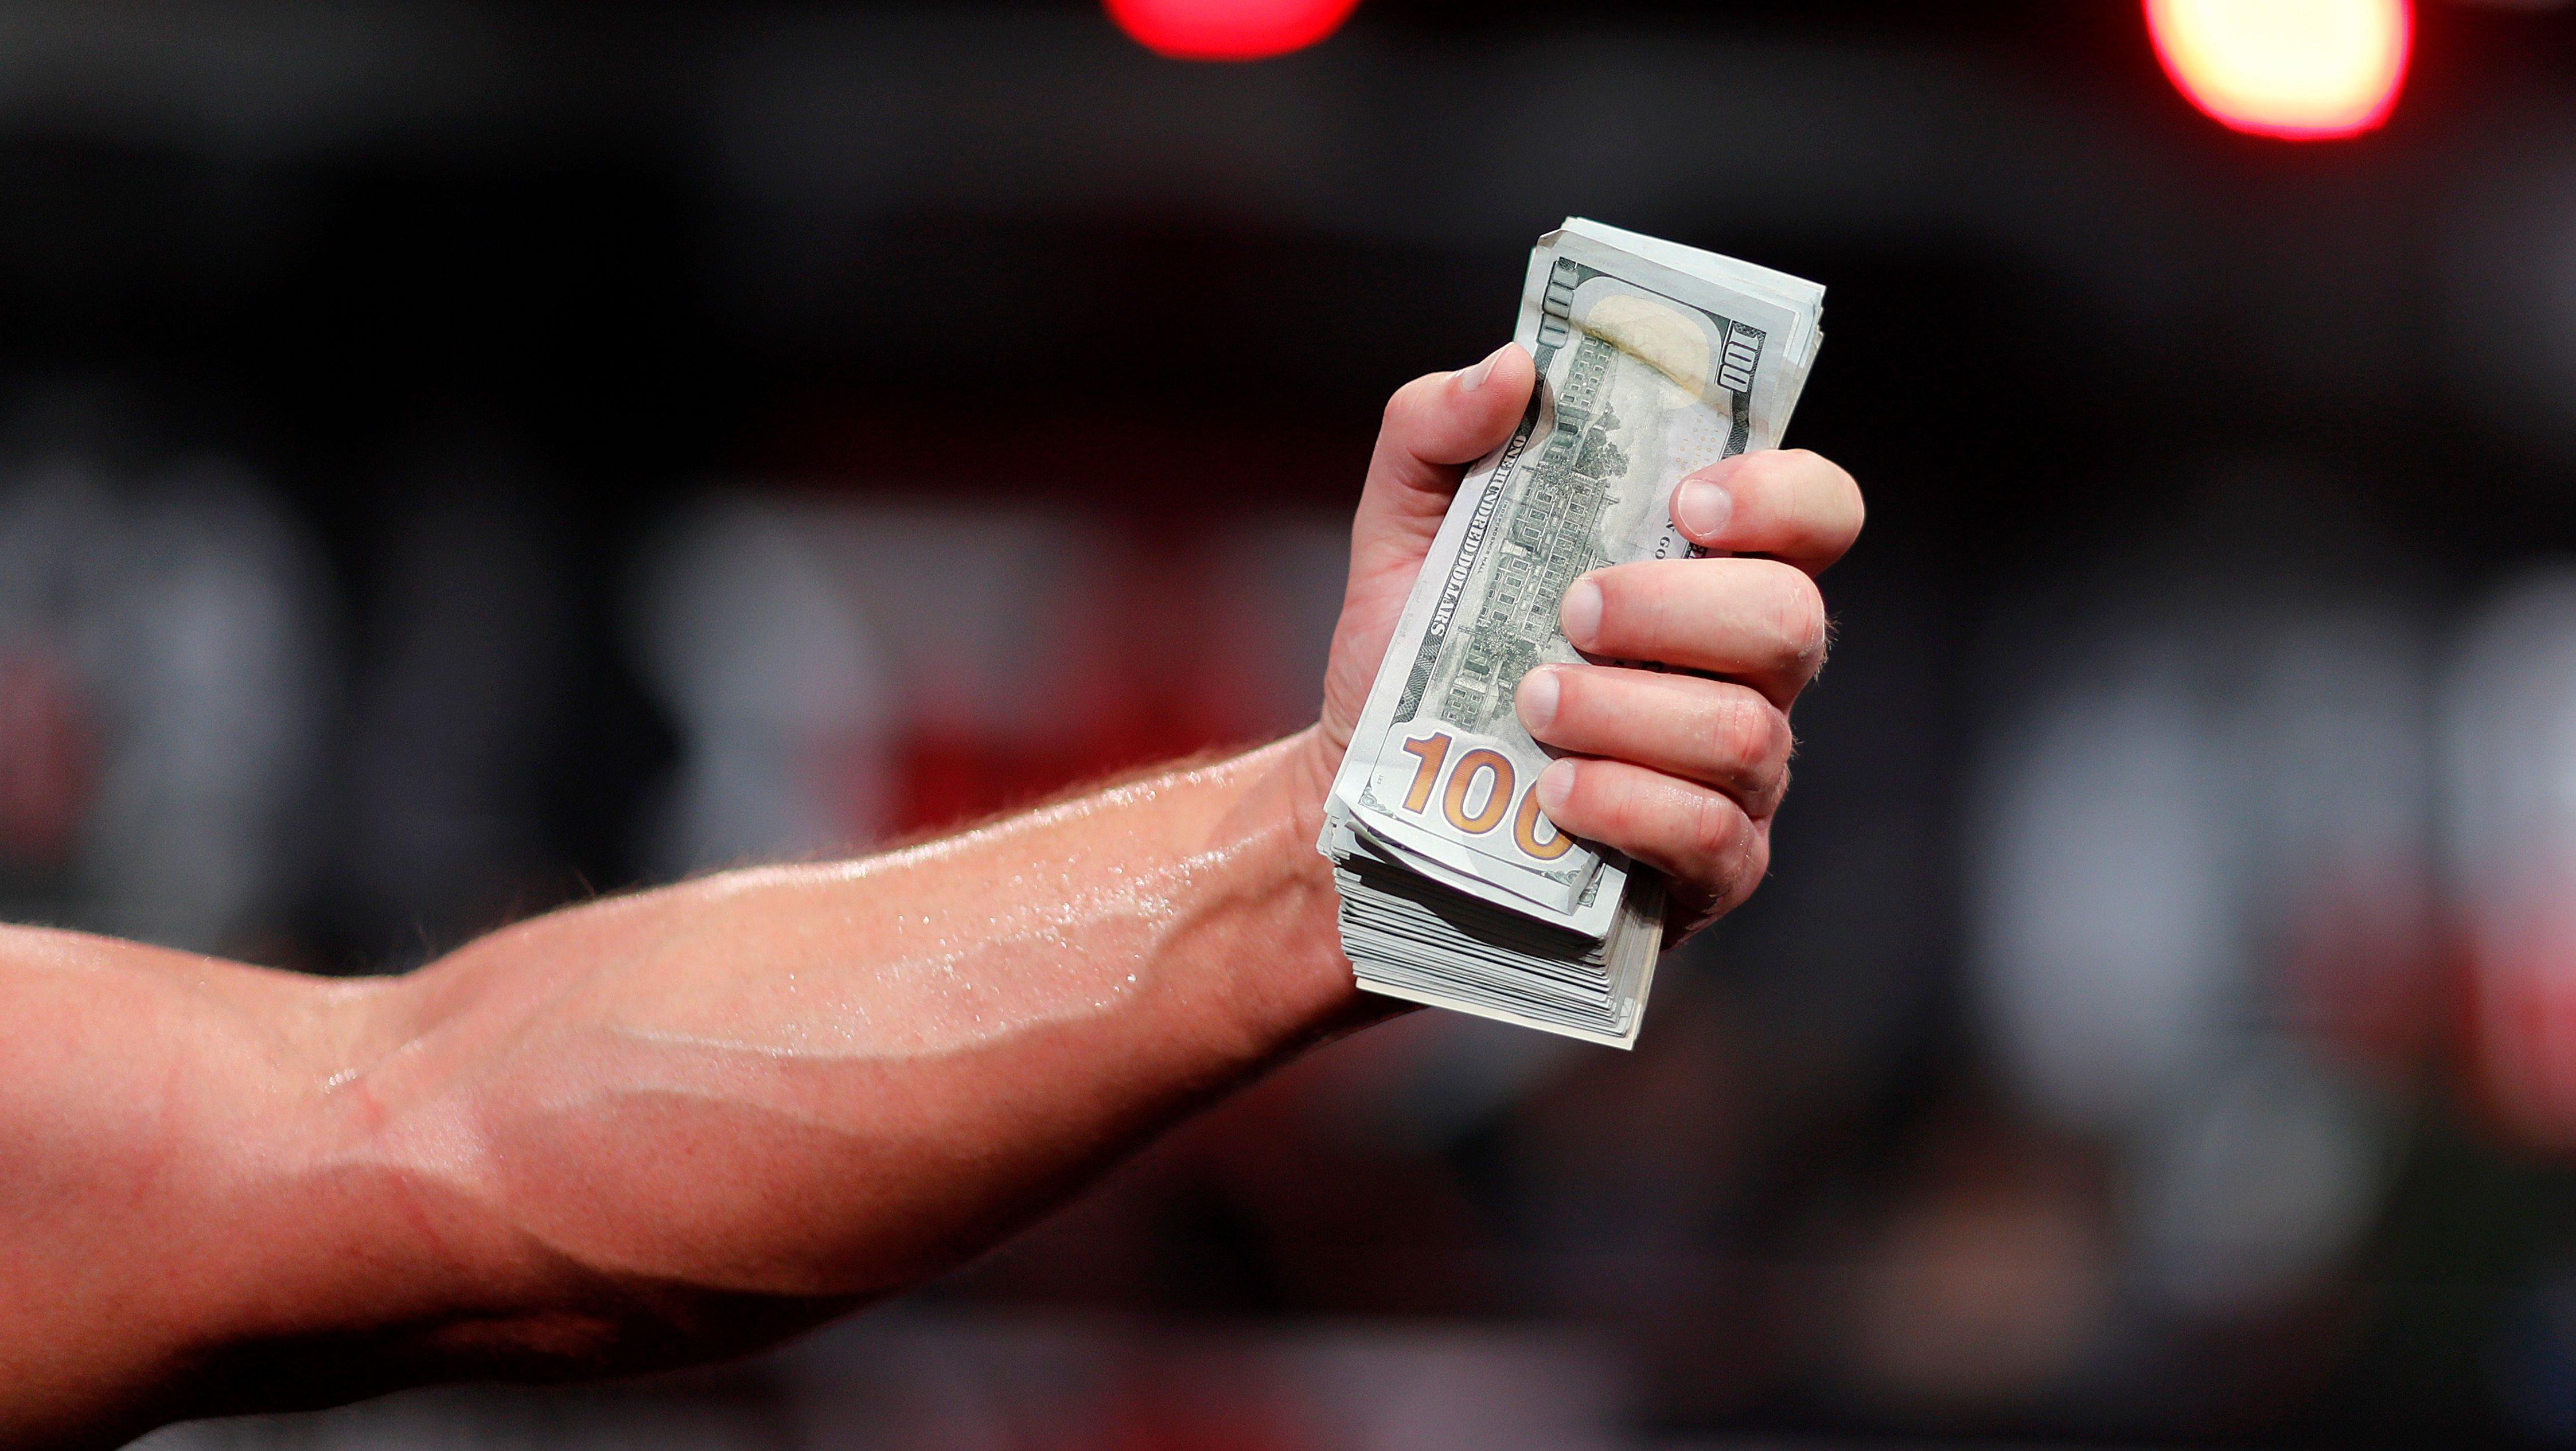 Money in the hand.